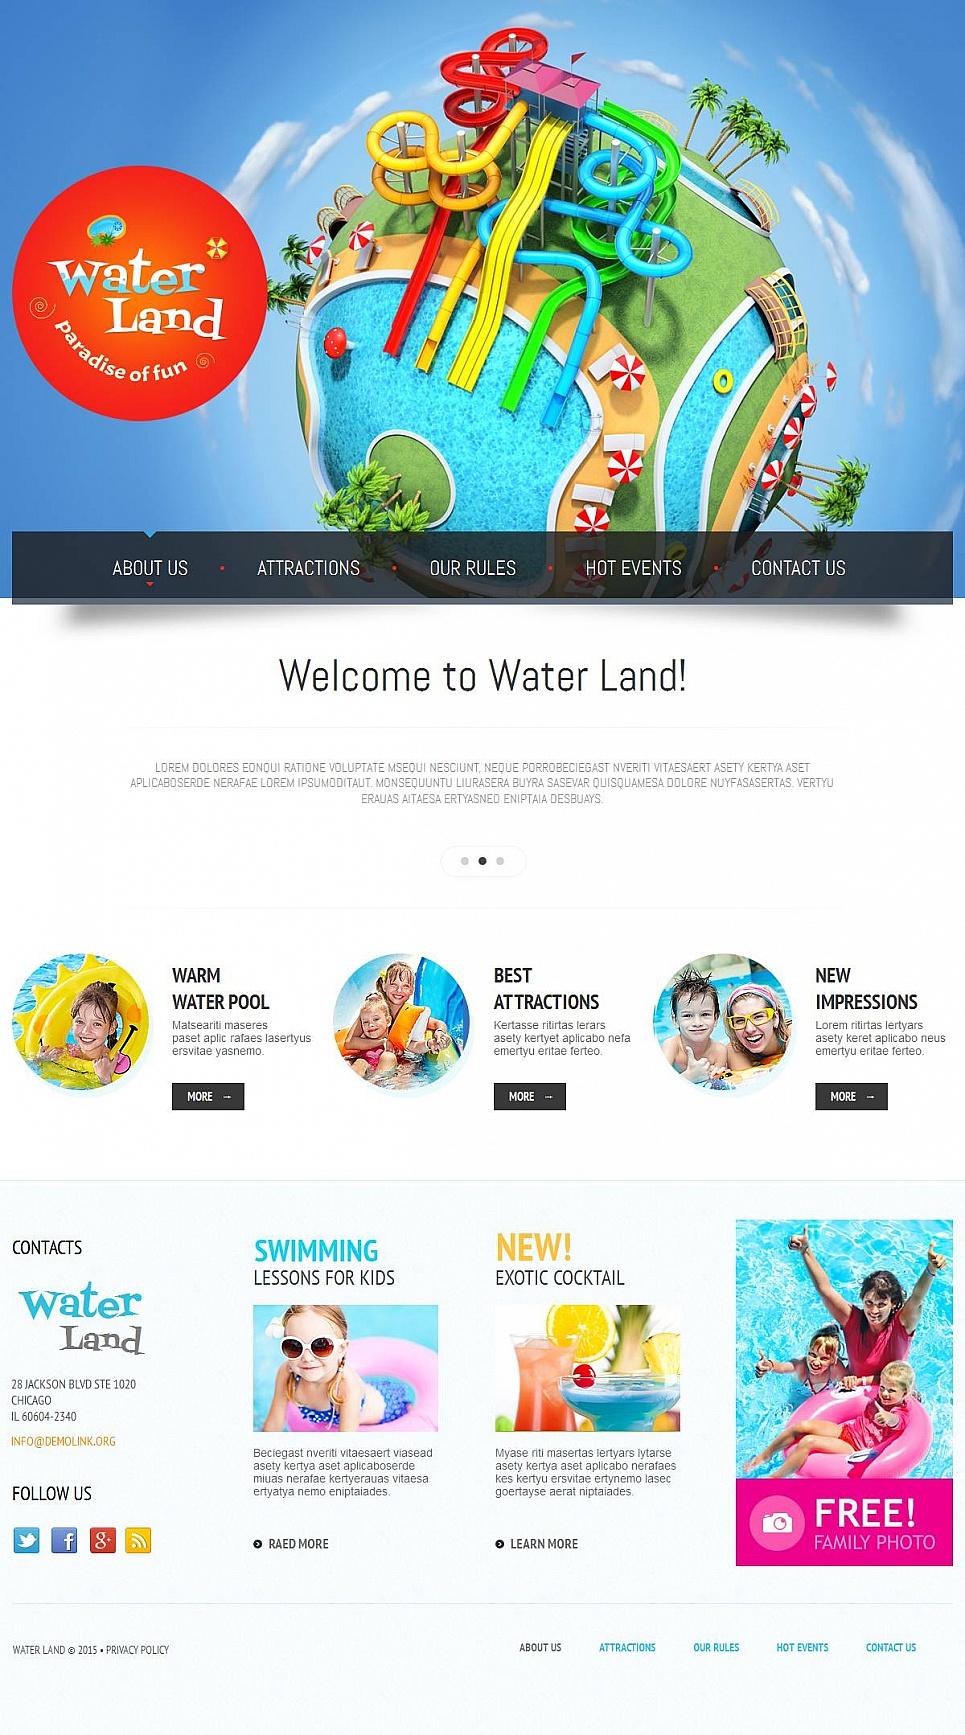 Adventure Water Park Theme - image